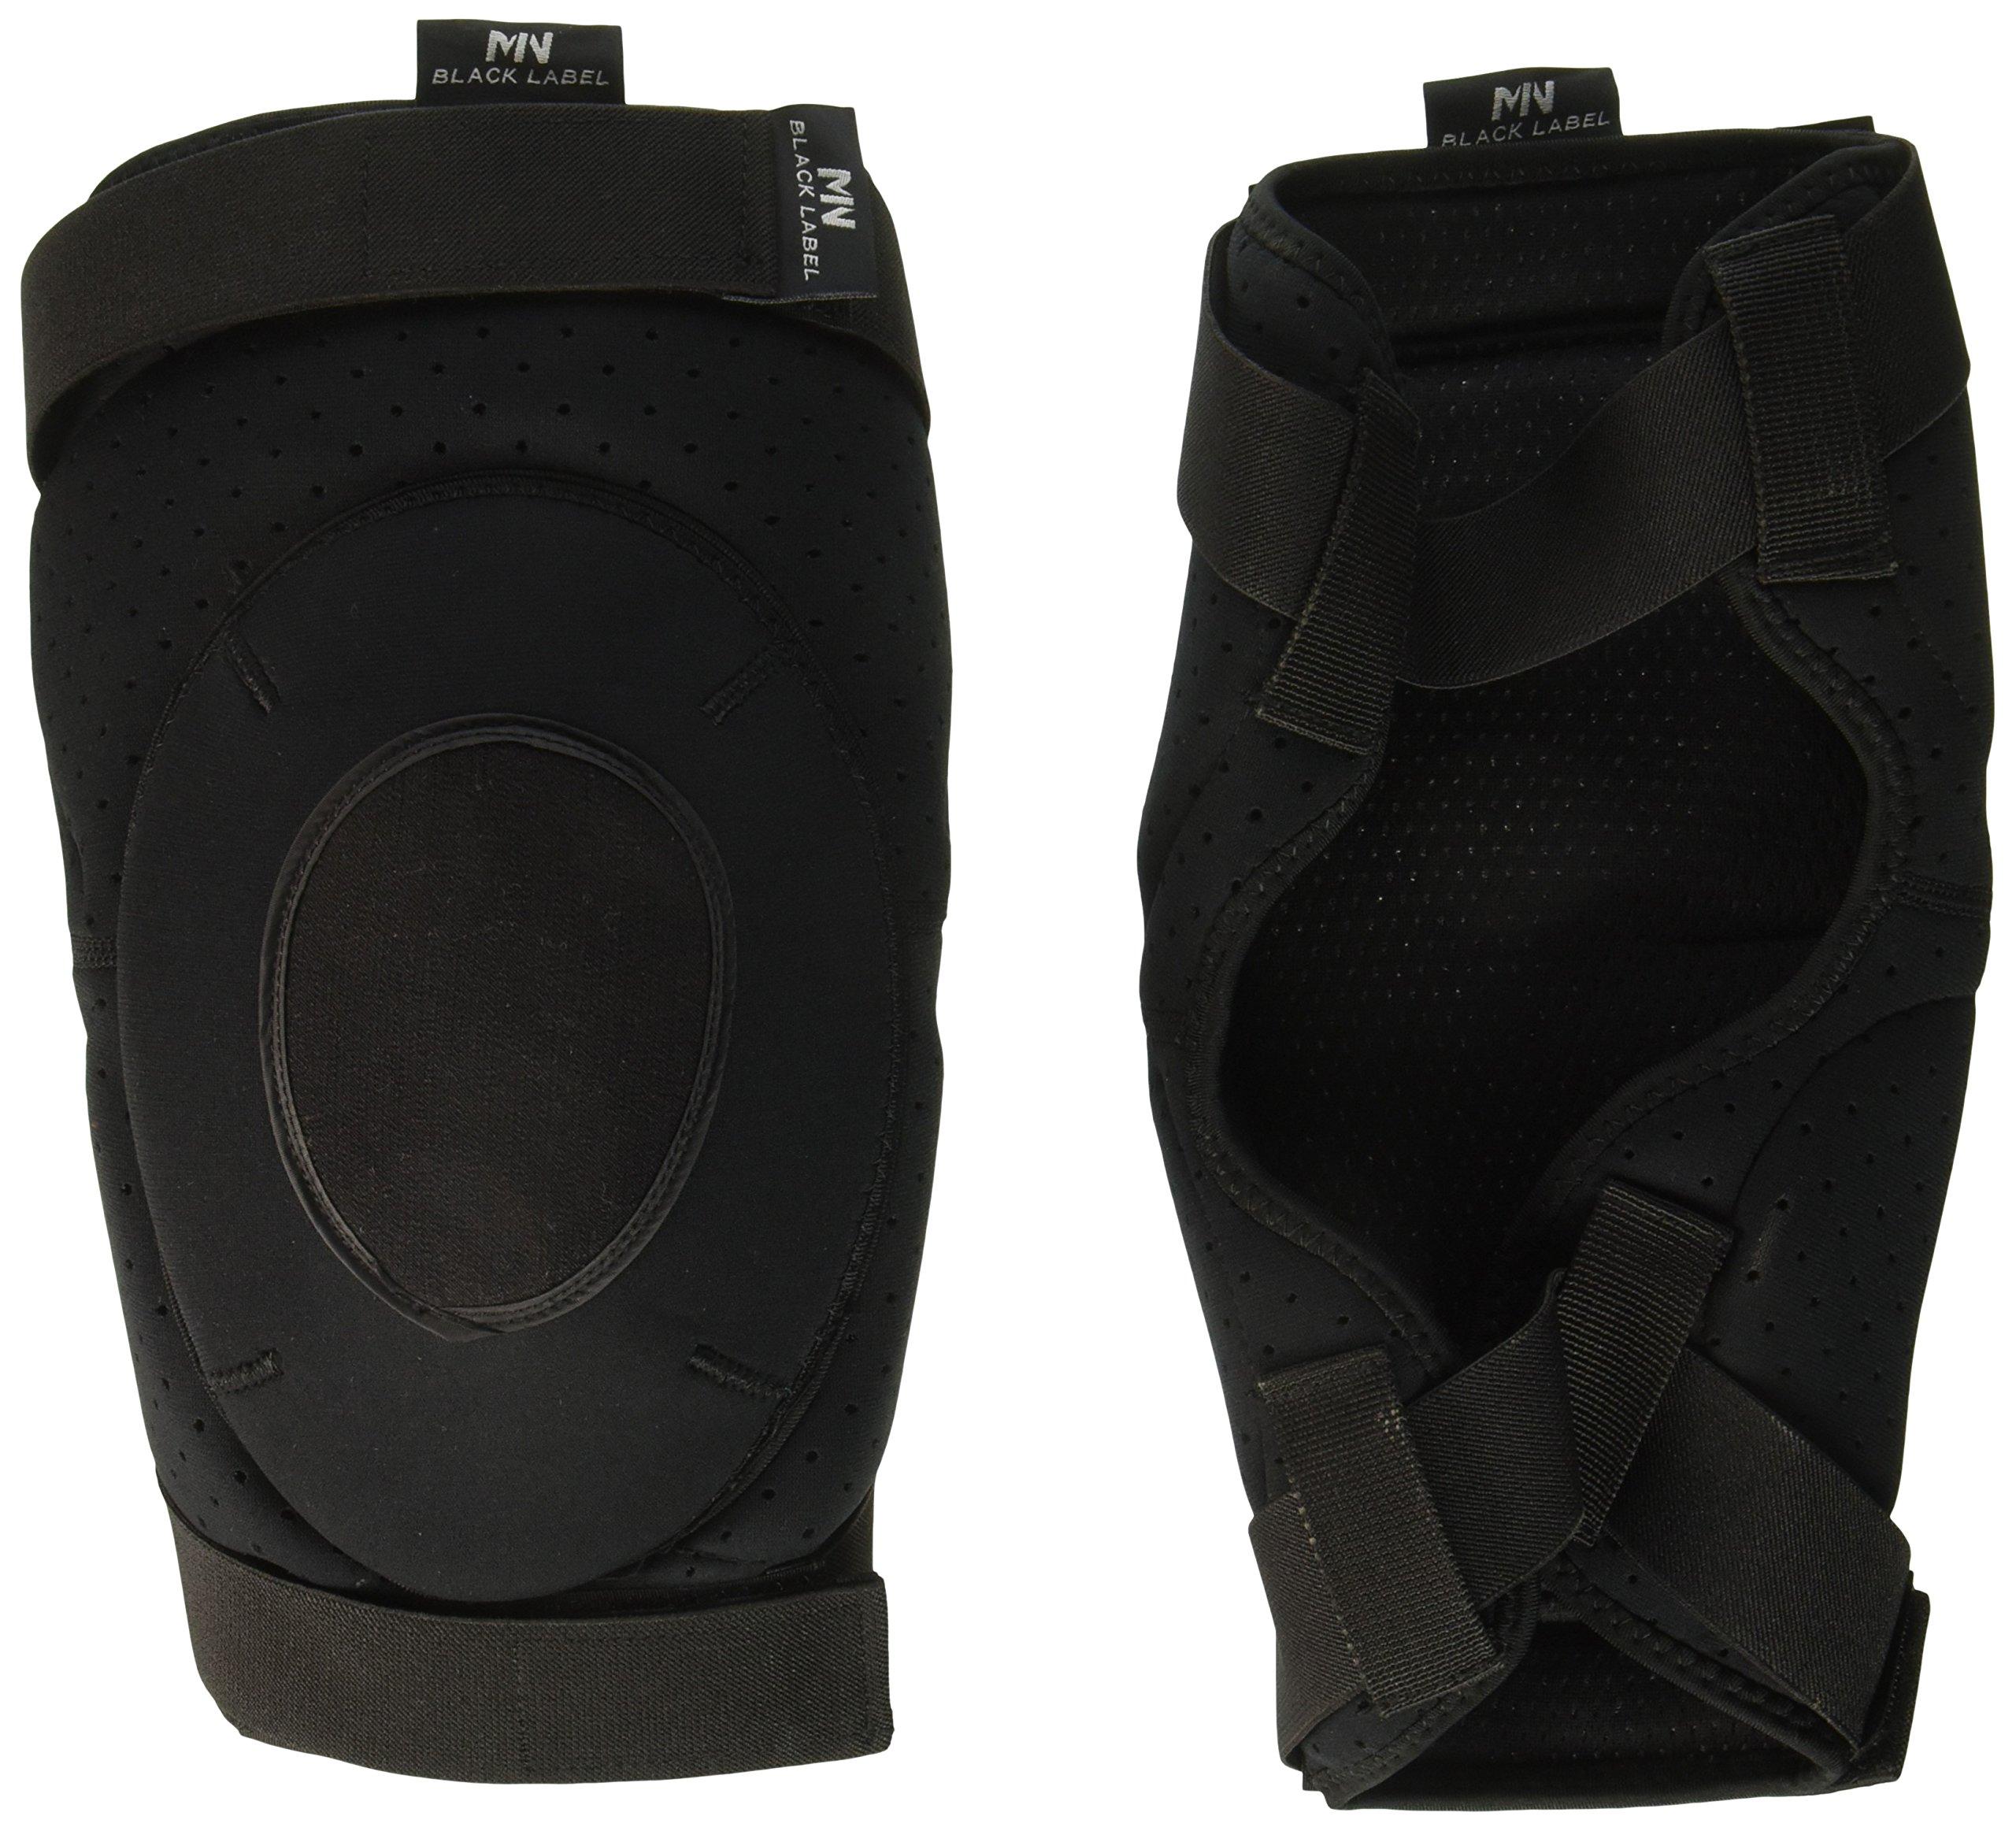 McGuire Ortho Wrap Kneepads MN-22410